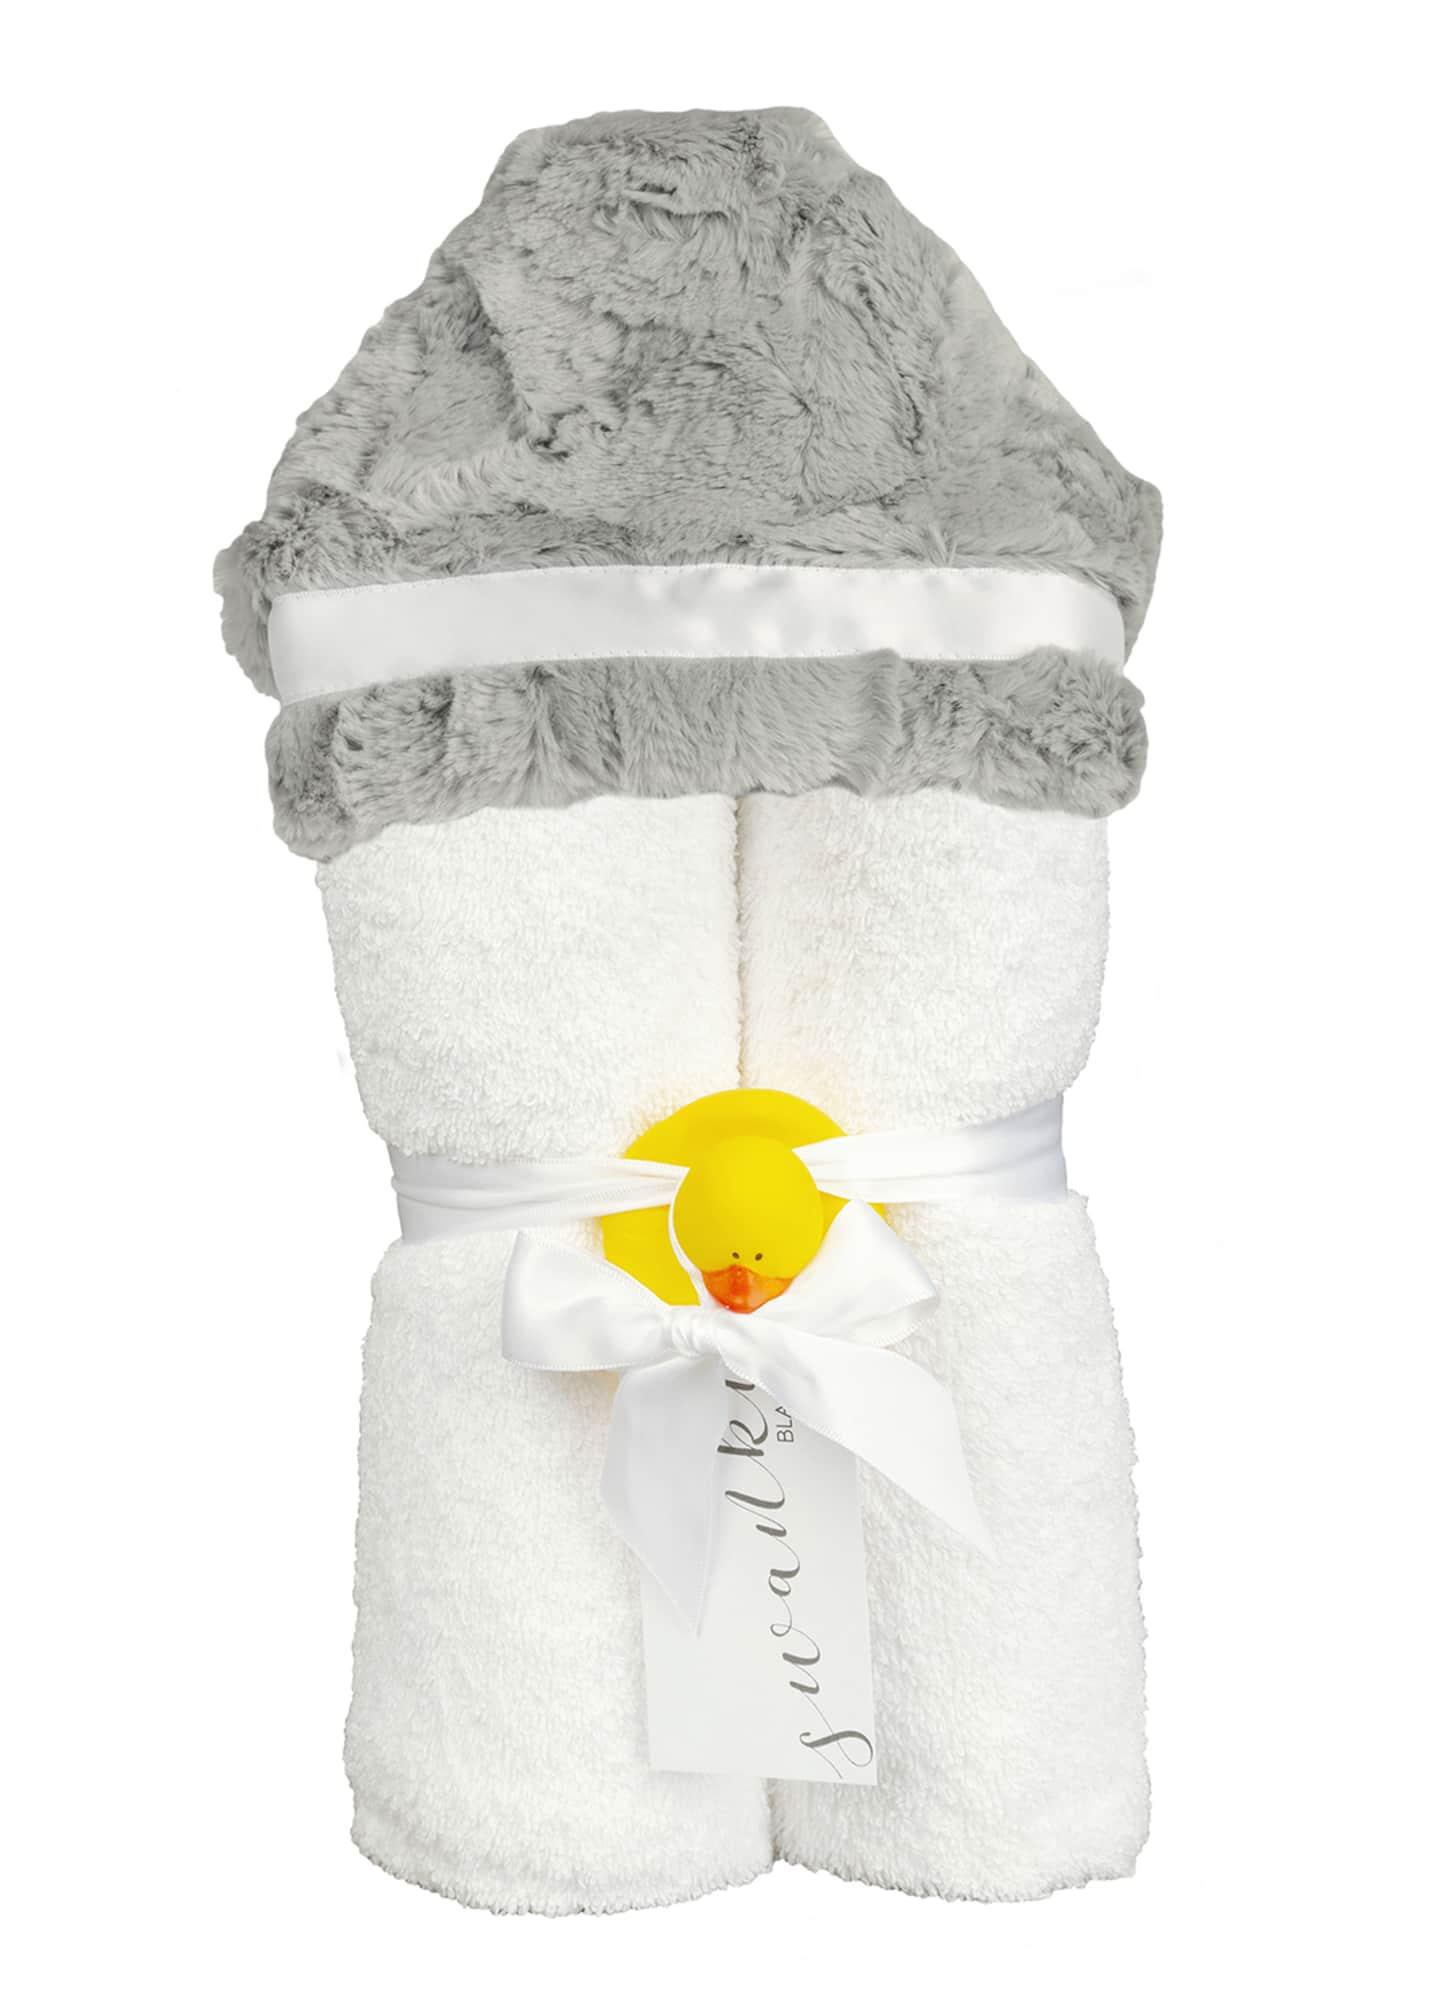 Swankie Blankie Addison Hooded Towel